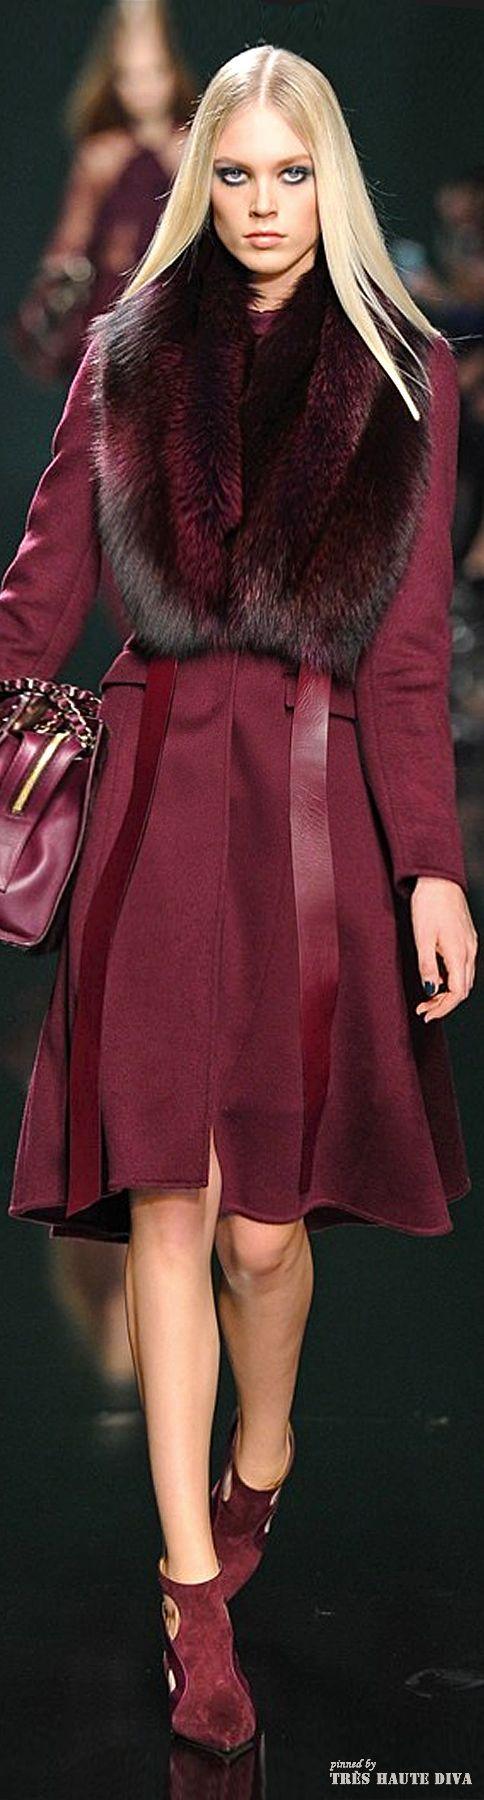 Haymes - Precious Theme - Berry Juice - Fashion Week Elie Saab Fall/Winter 2014 ...